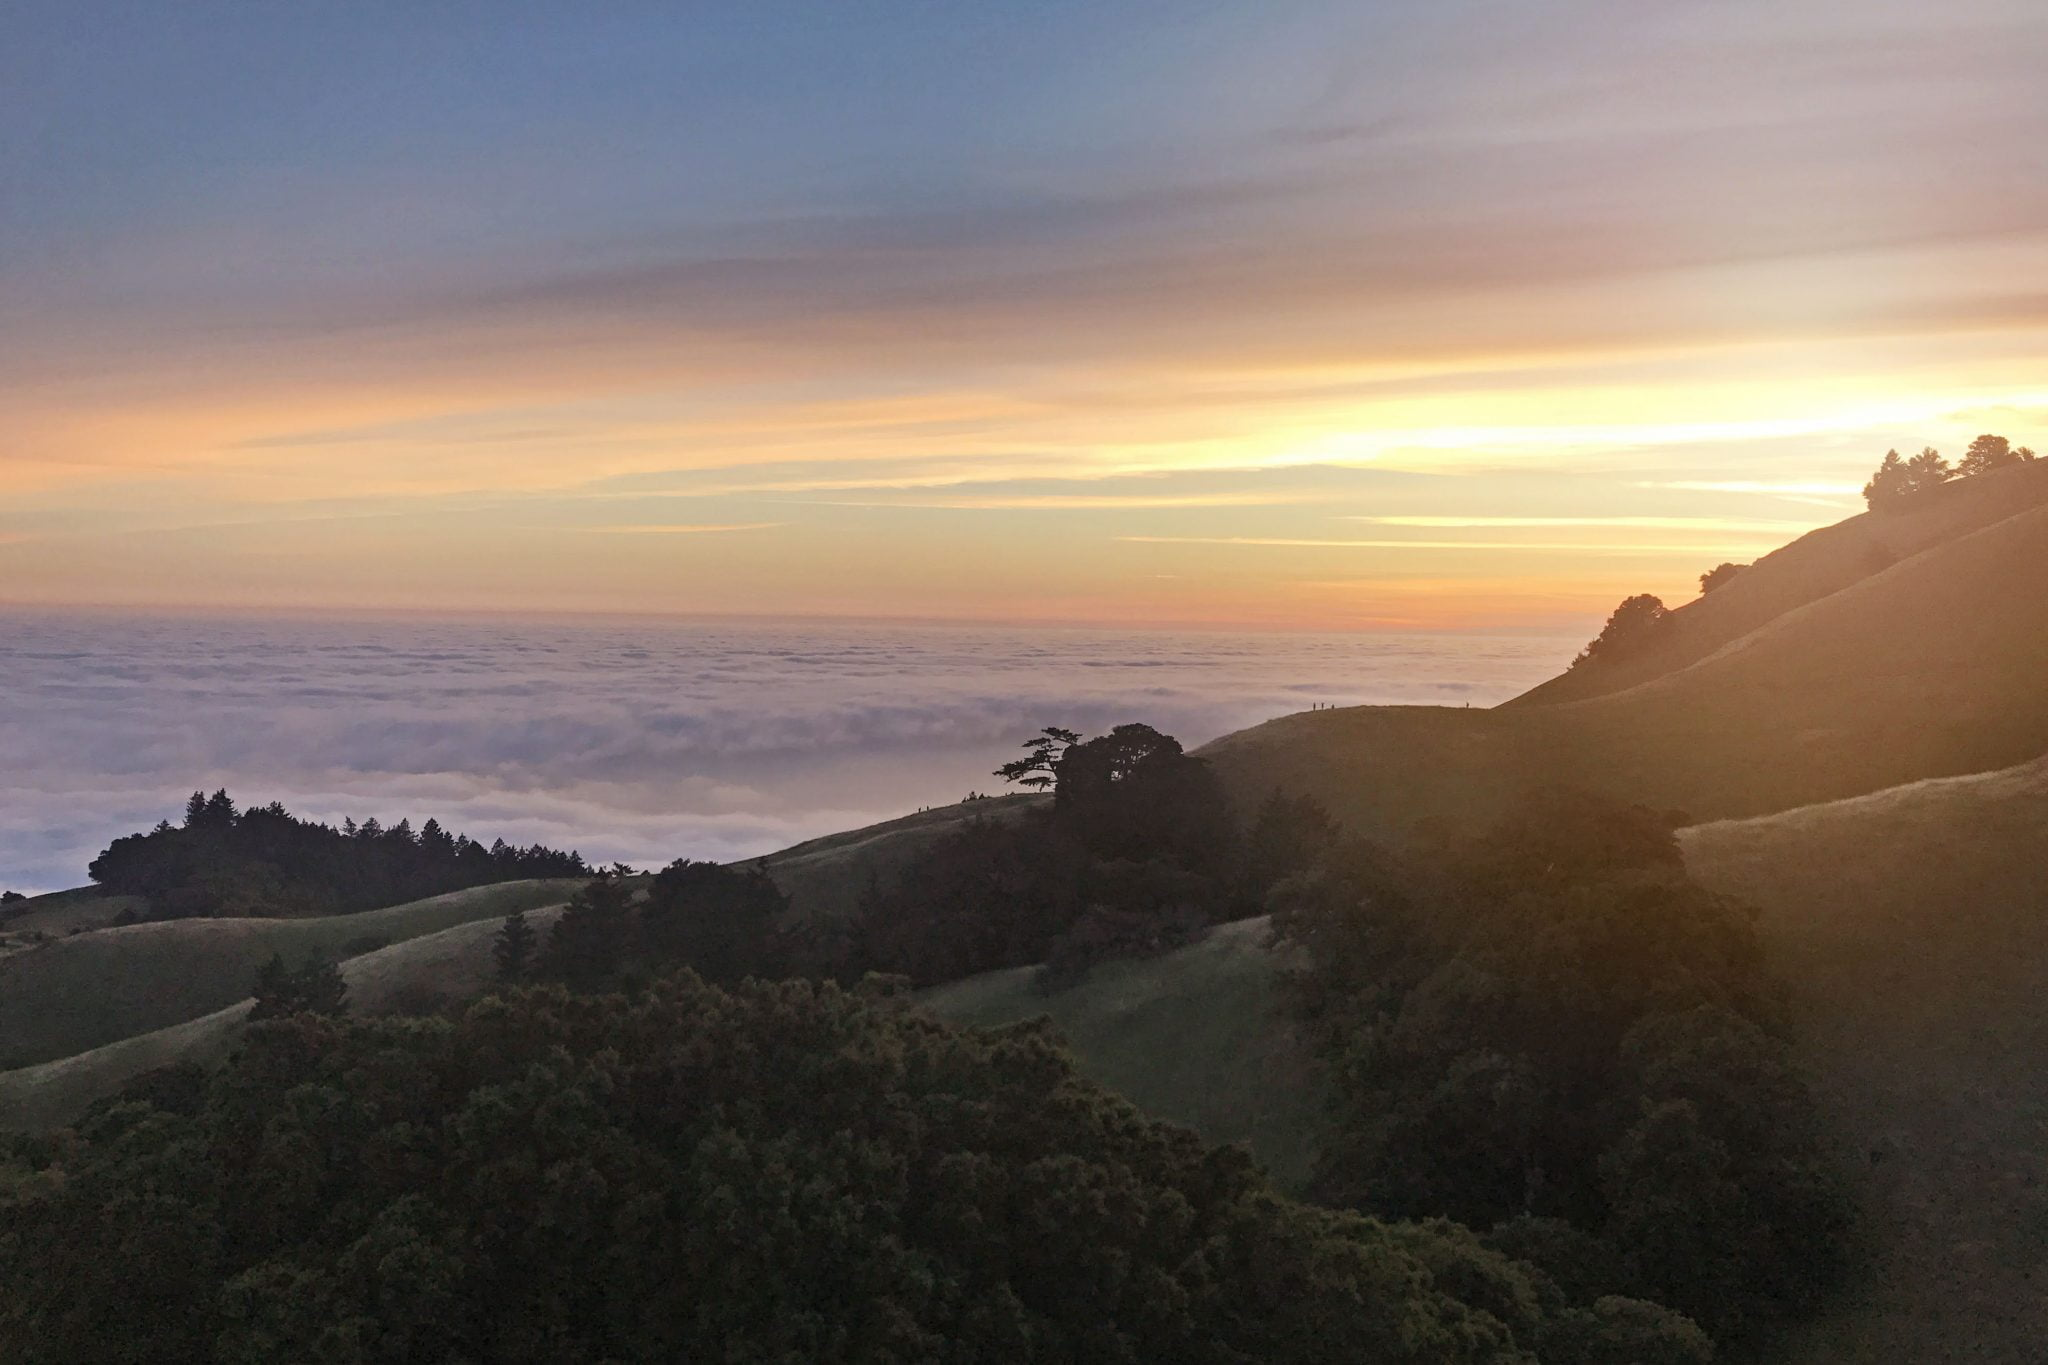 Principles for Adventure Travel - Sunset